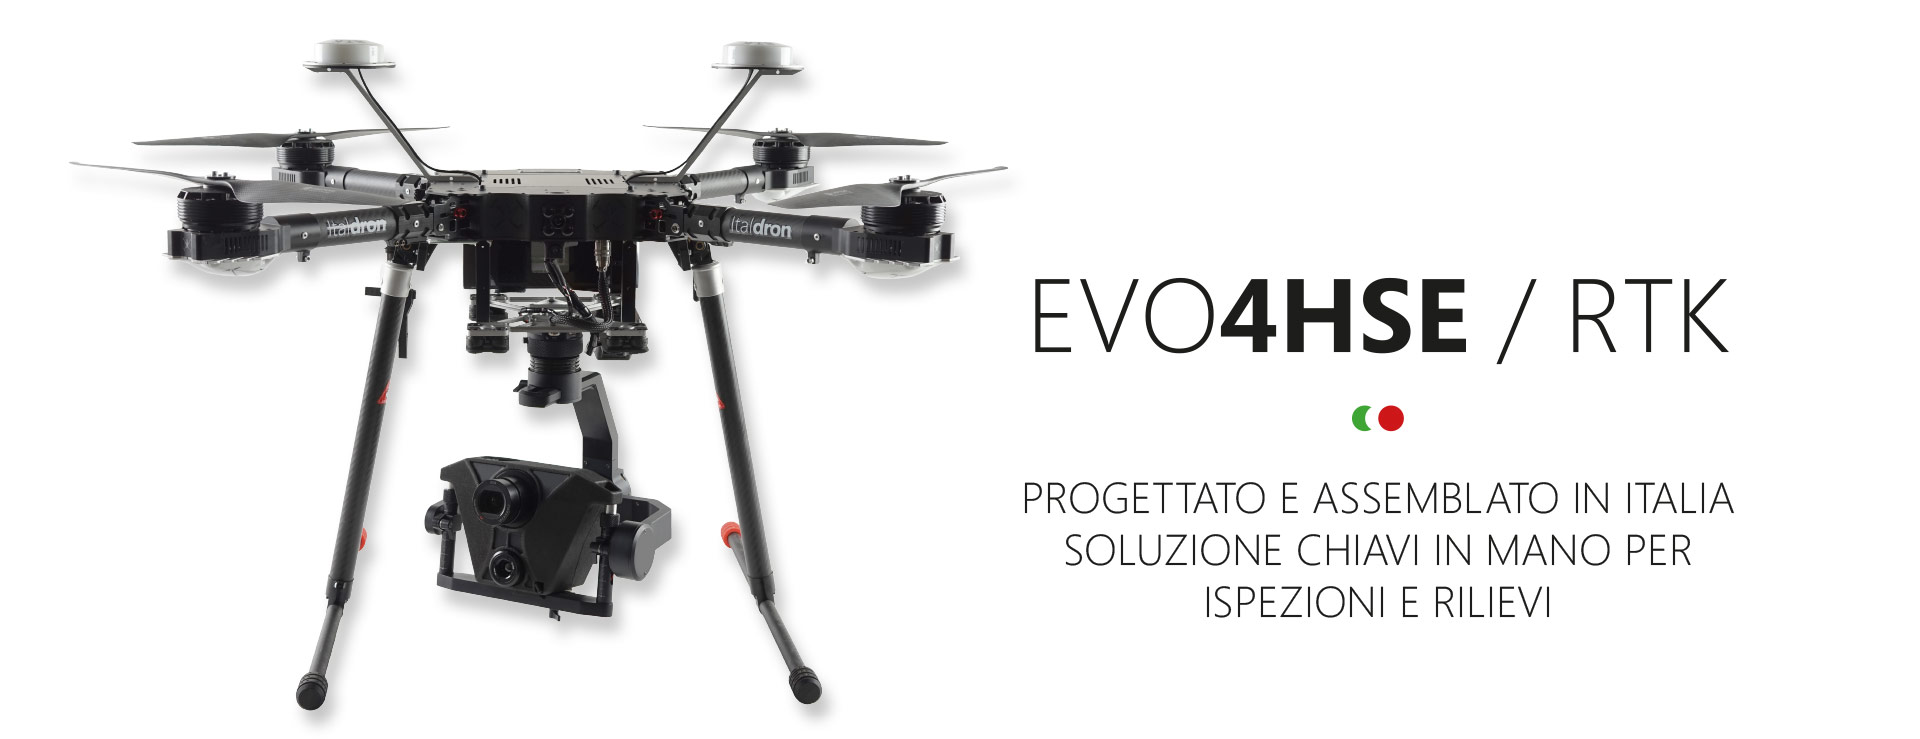 professional drones GCSV16